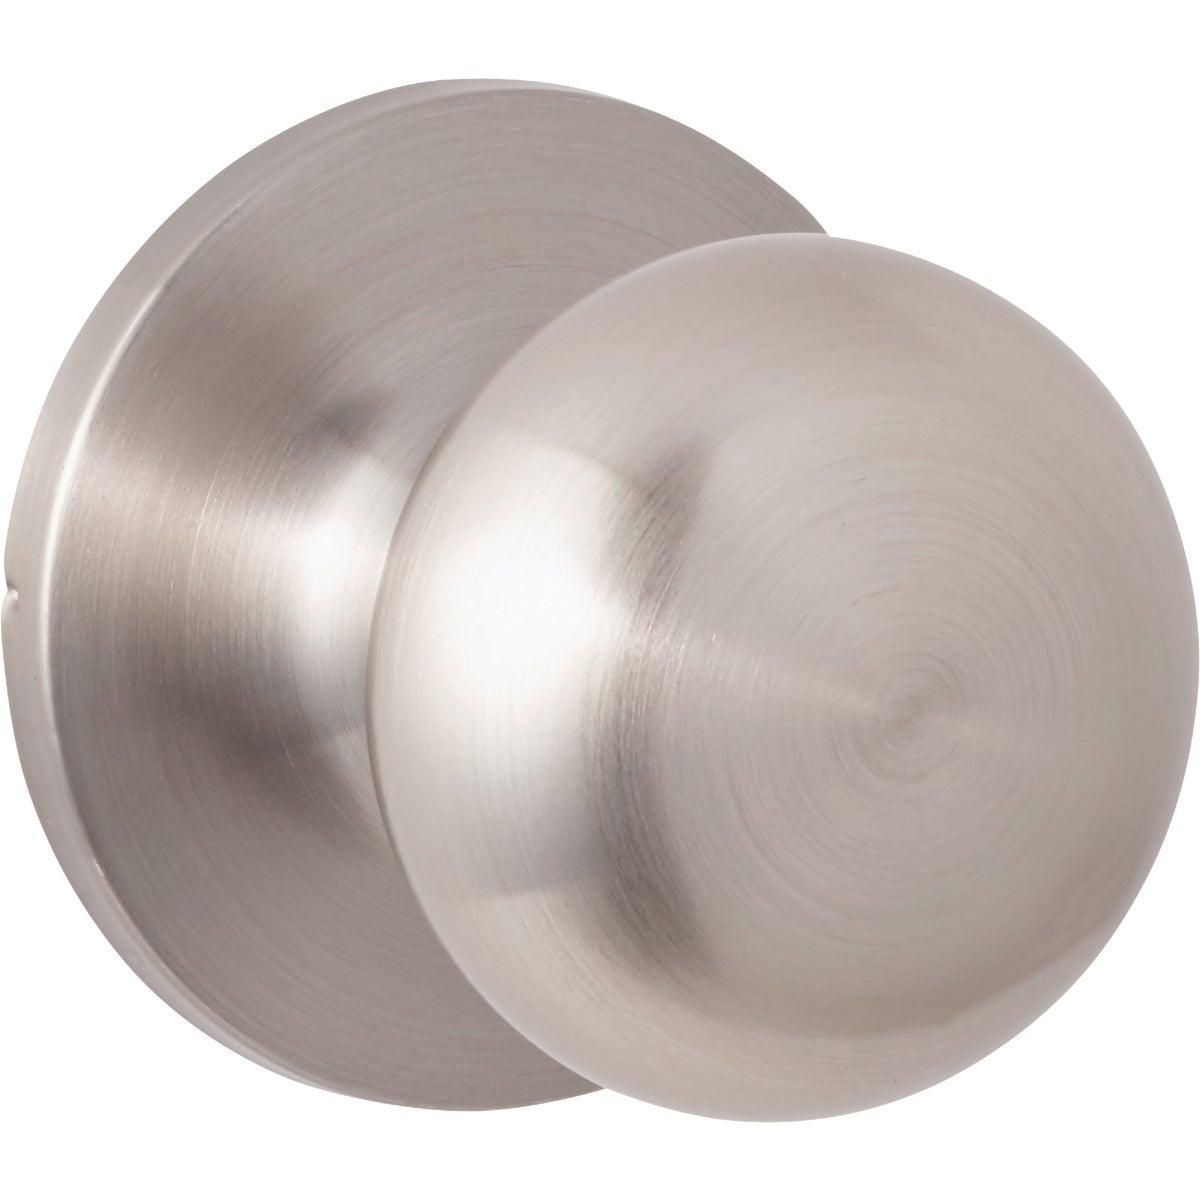 Steel Pro SN CP 1/2RD PASSAGE LOCK 5287SN-PS CP